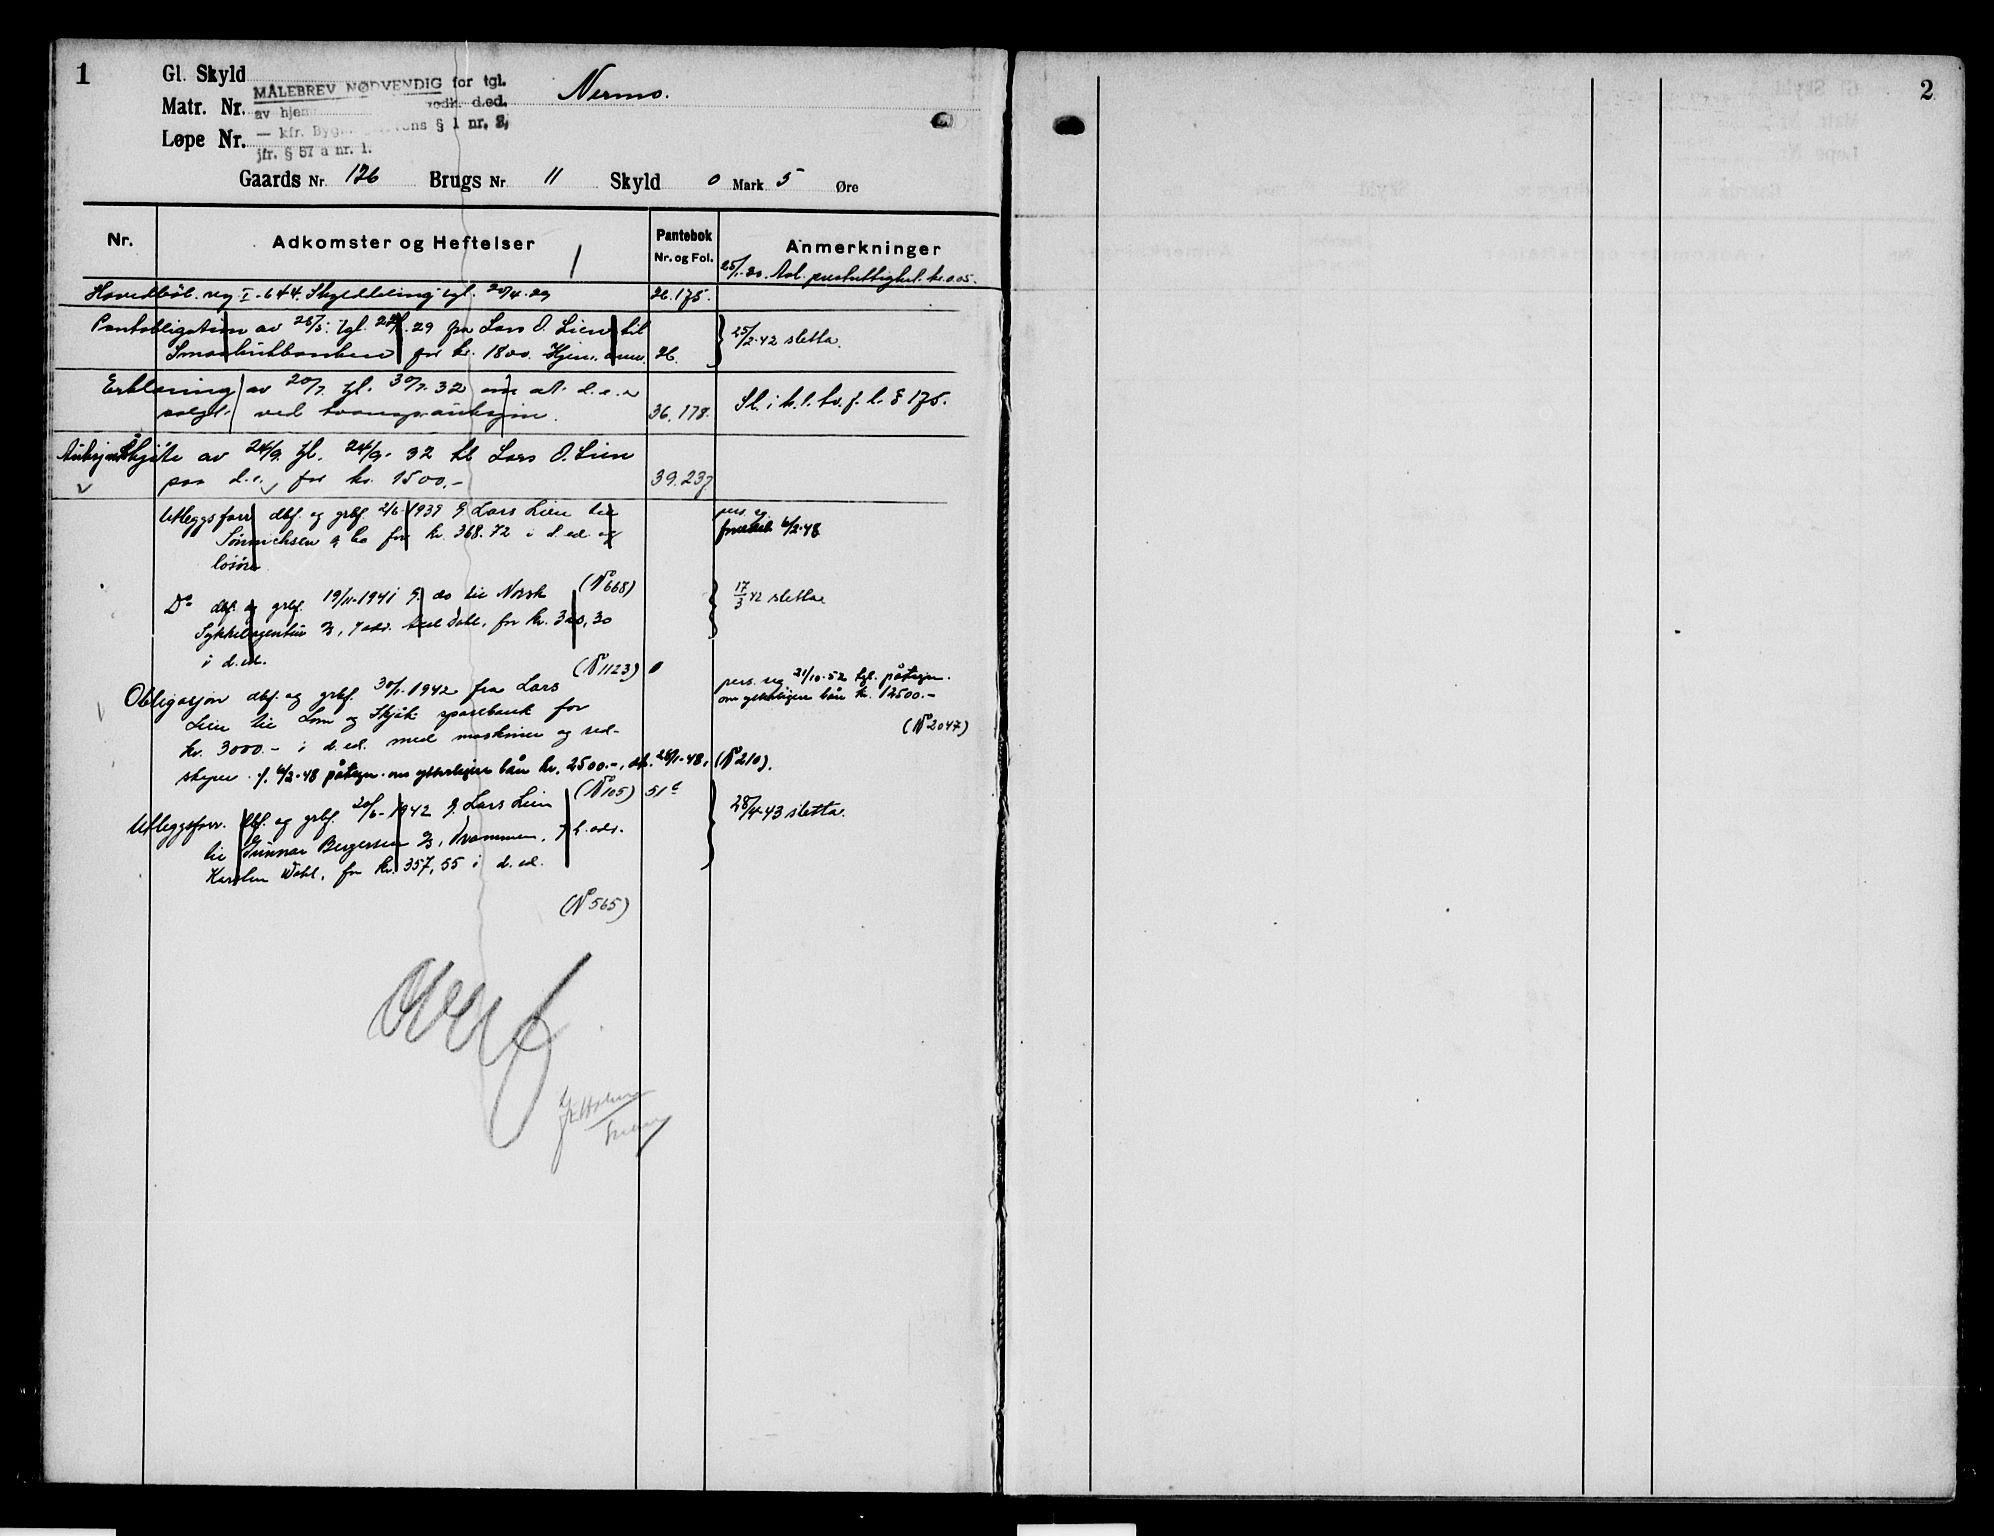 SAH, Nord-Gudbrandsdal tingrett, H/Ha/Had/L0005: Panteregister nr. 5, 1928-1950, s. 1-2